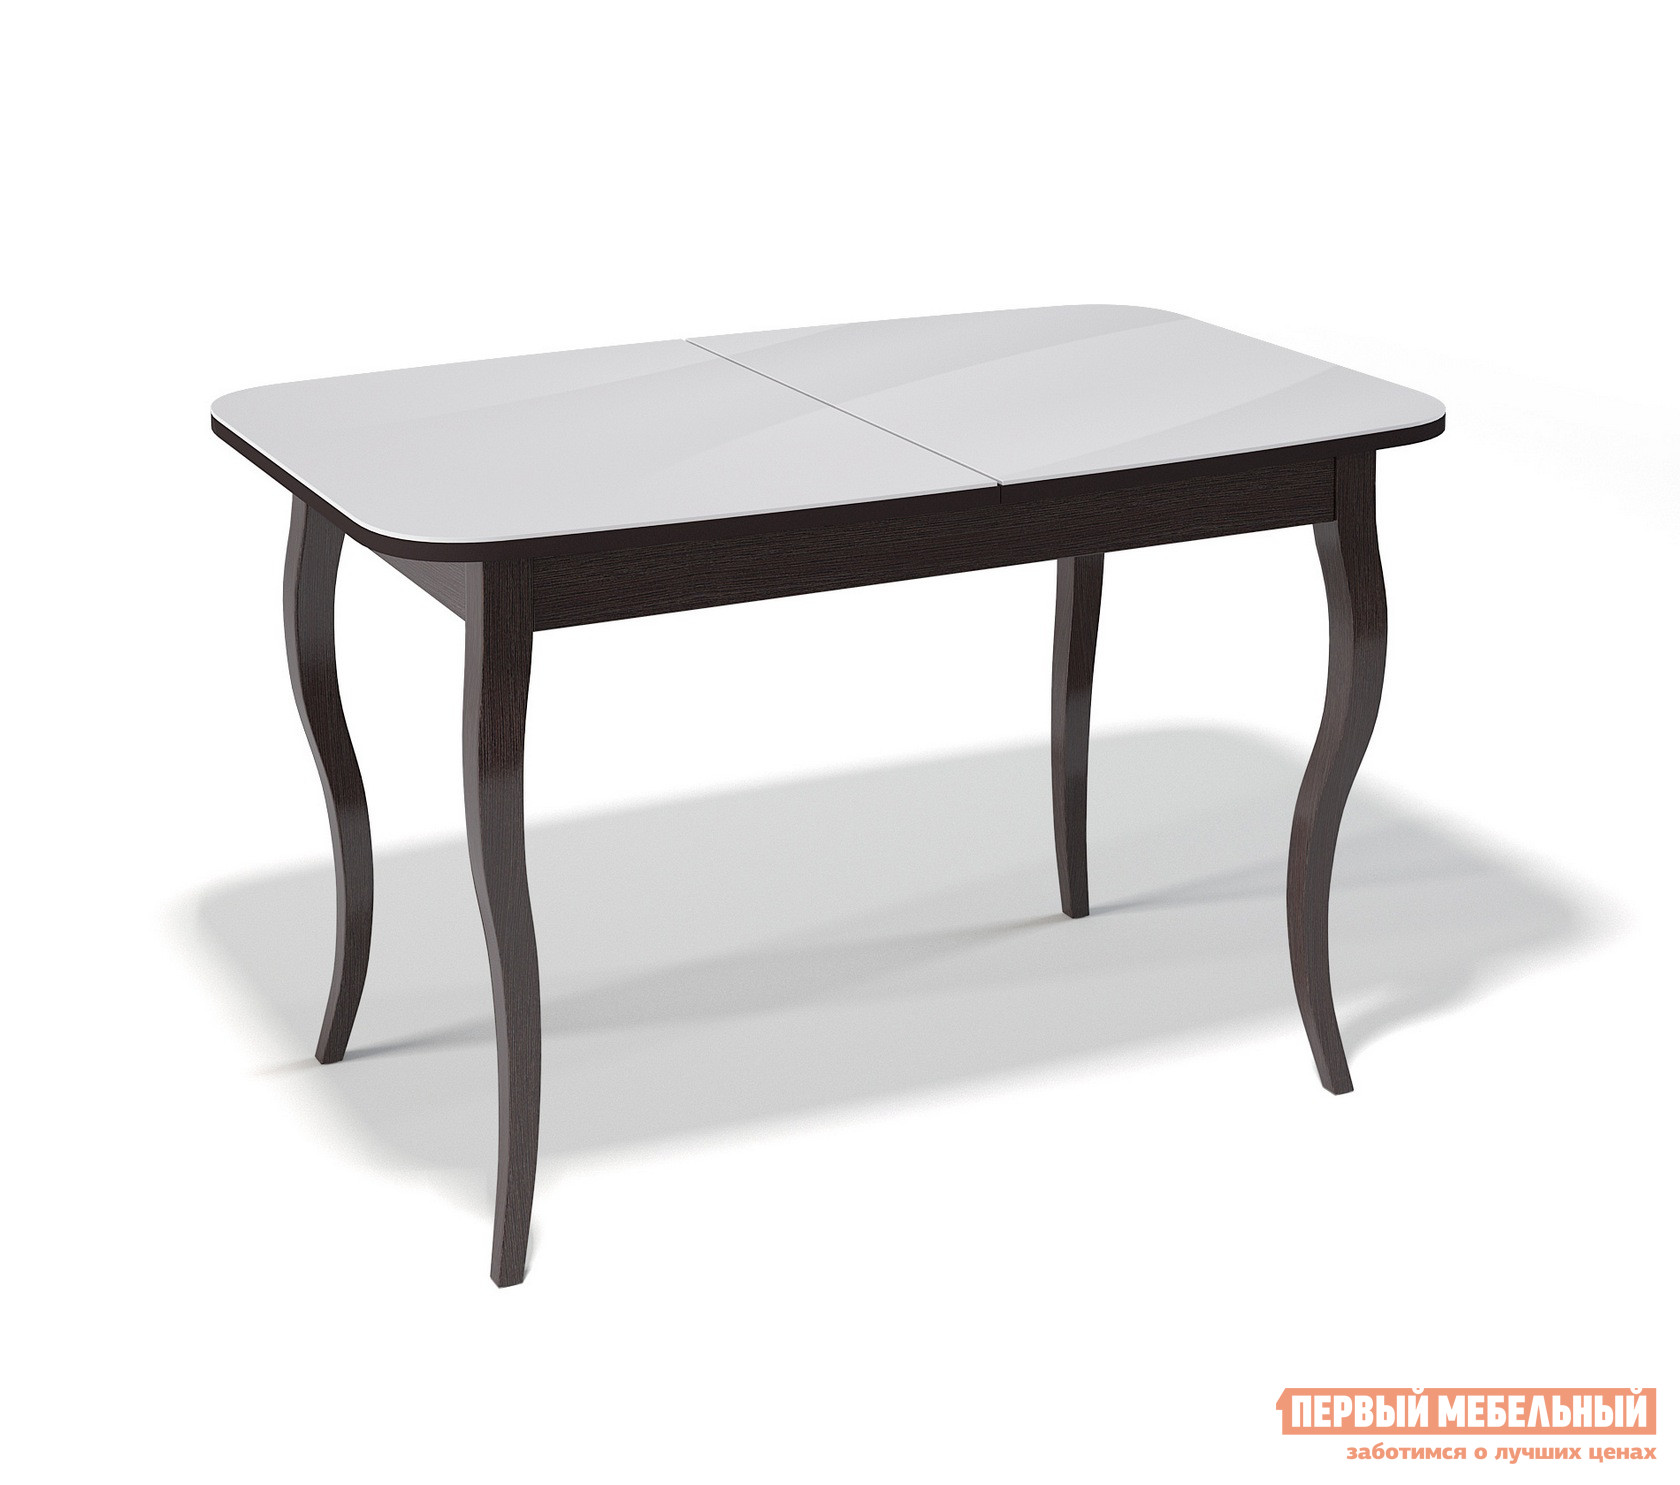 Кухонный стол ДИК KENNER 1200С круглый кухонный стол глянцевый дик kenner 1000с